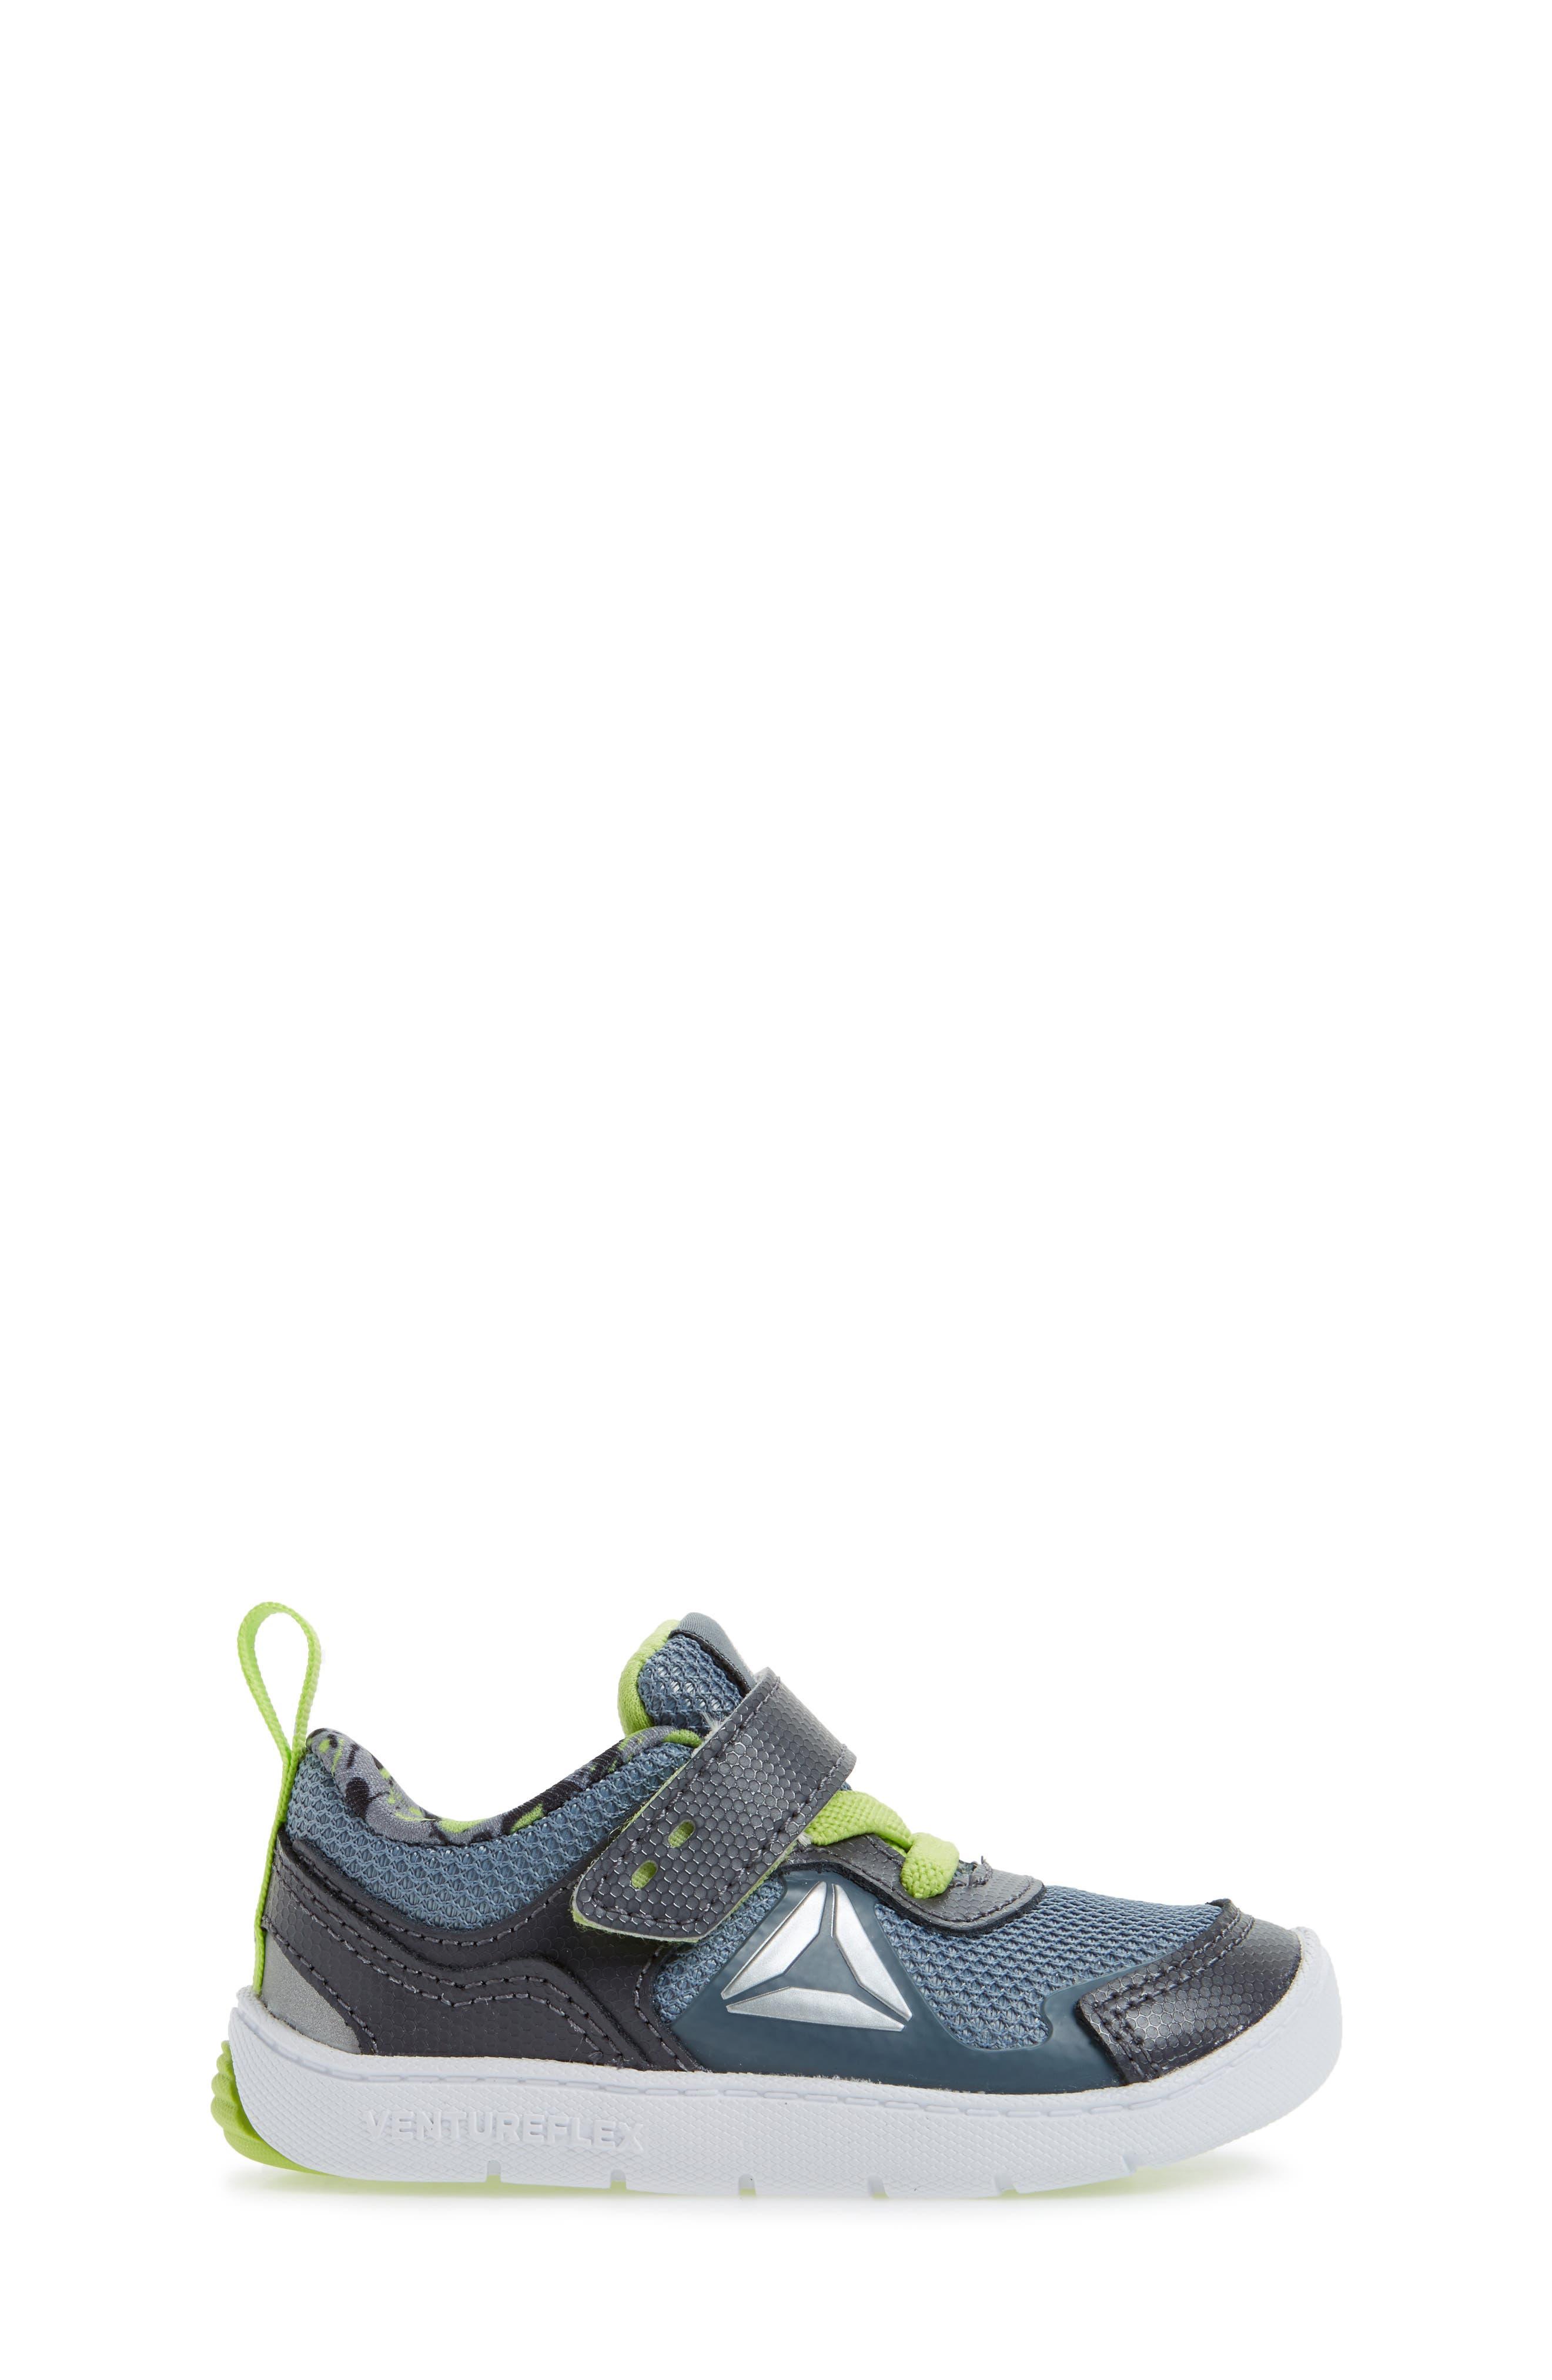 Ventureflex Stride 5.0 Sneaker,                             Alternate thumbnail 3, color,                             020